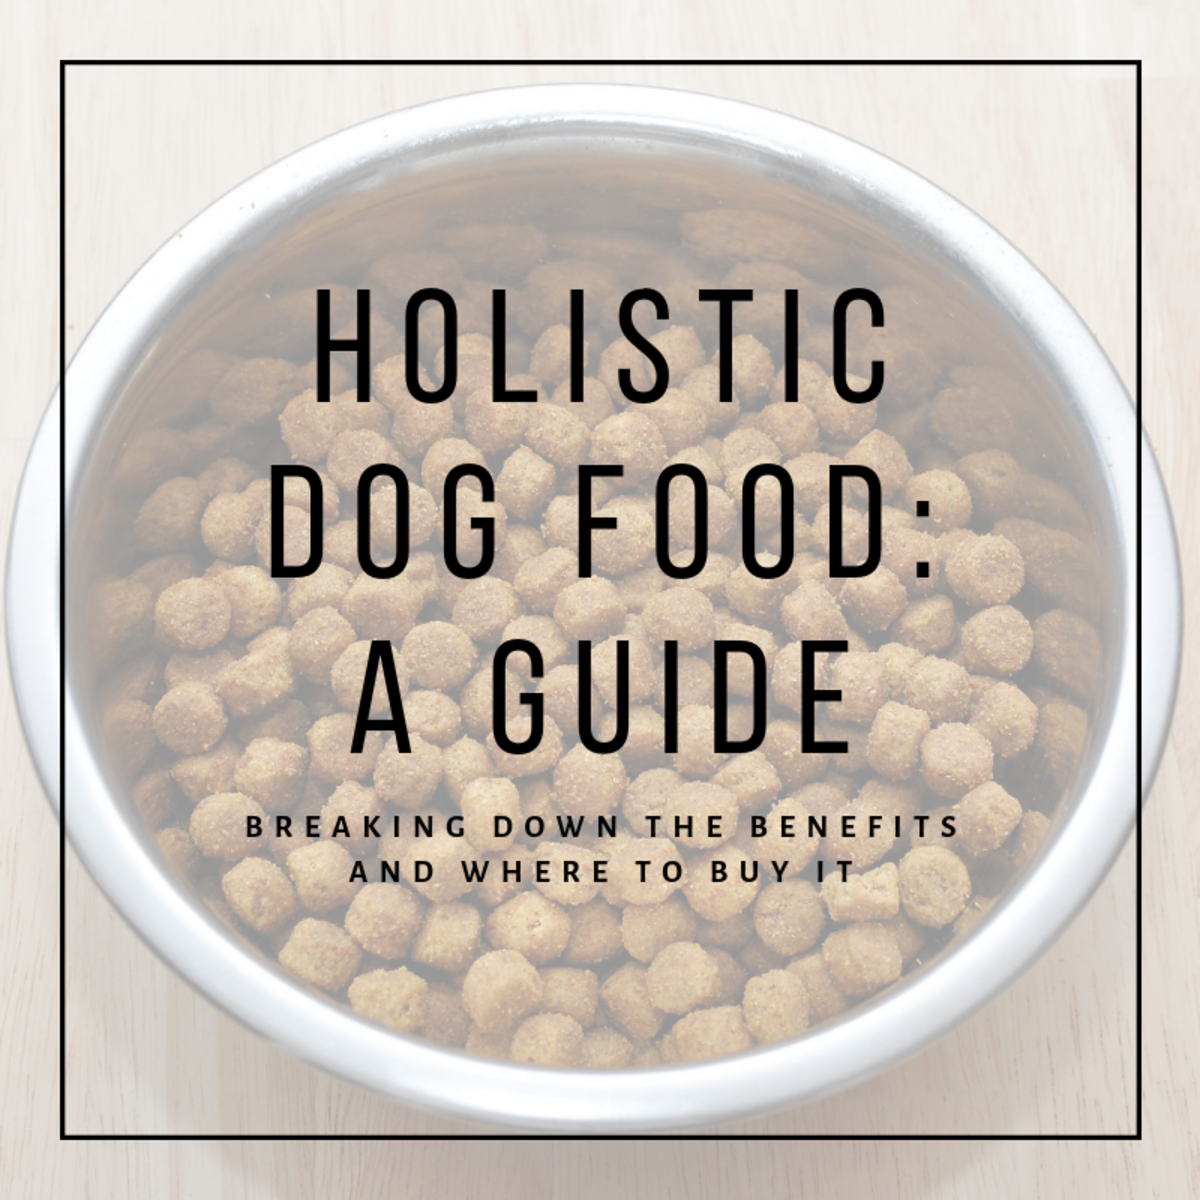 The Benefits of Holistic Dog Food